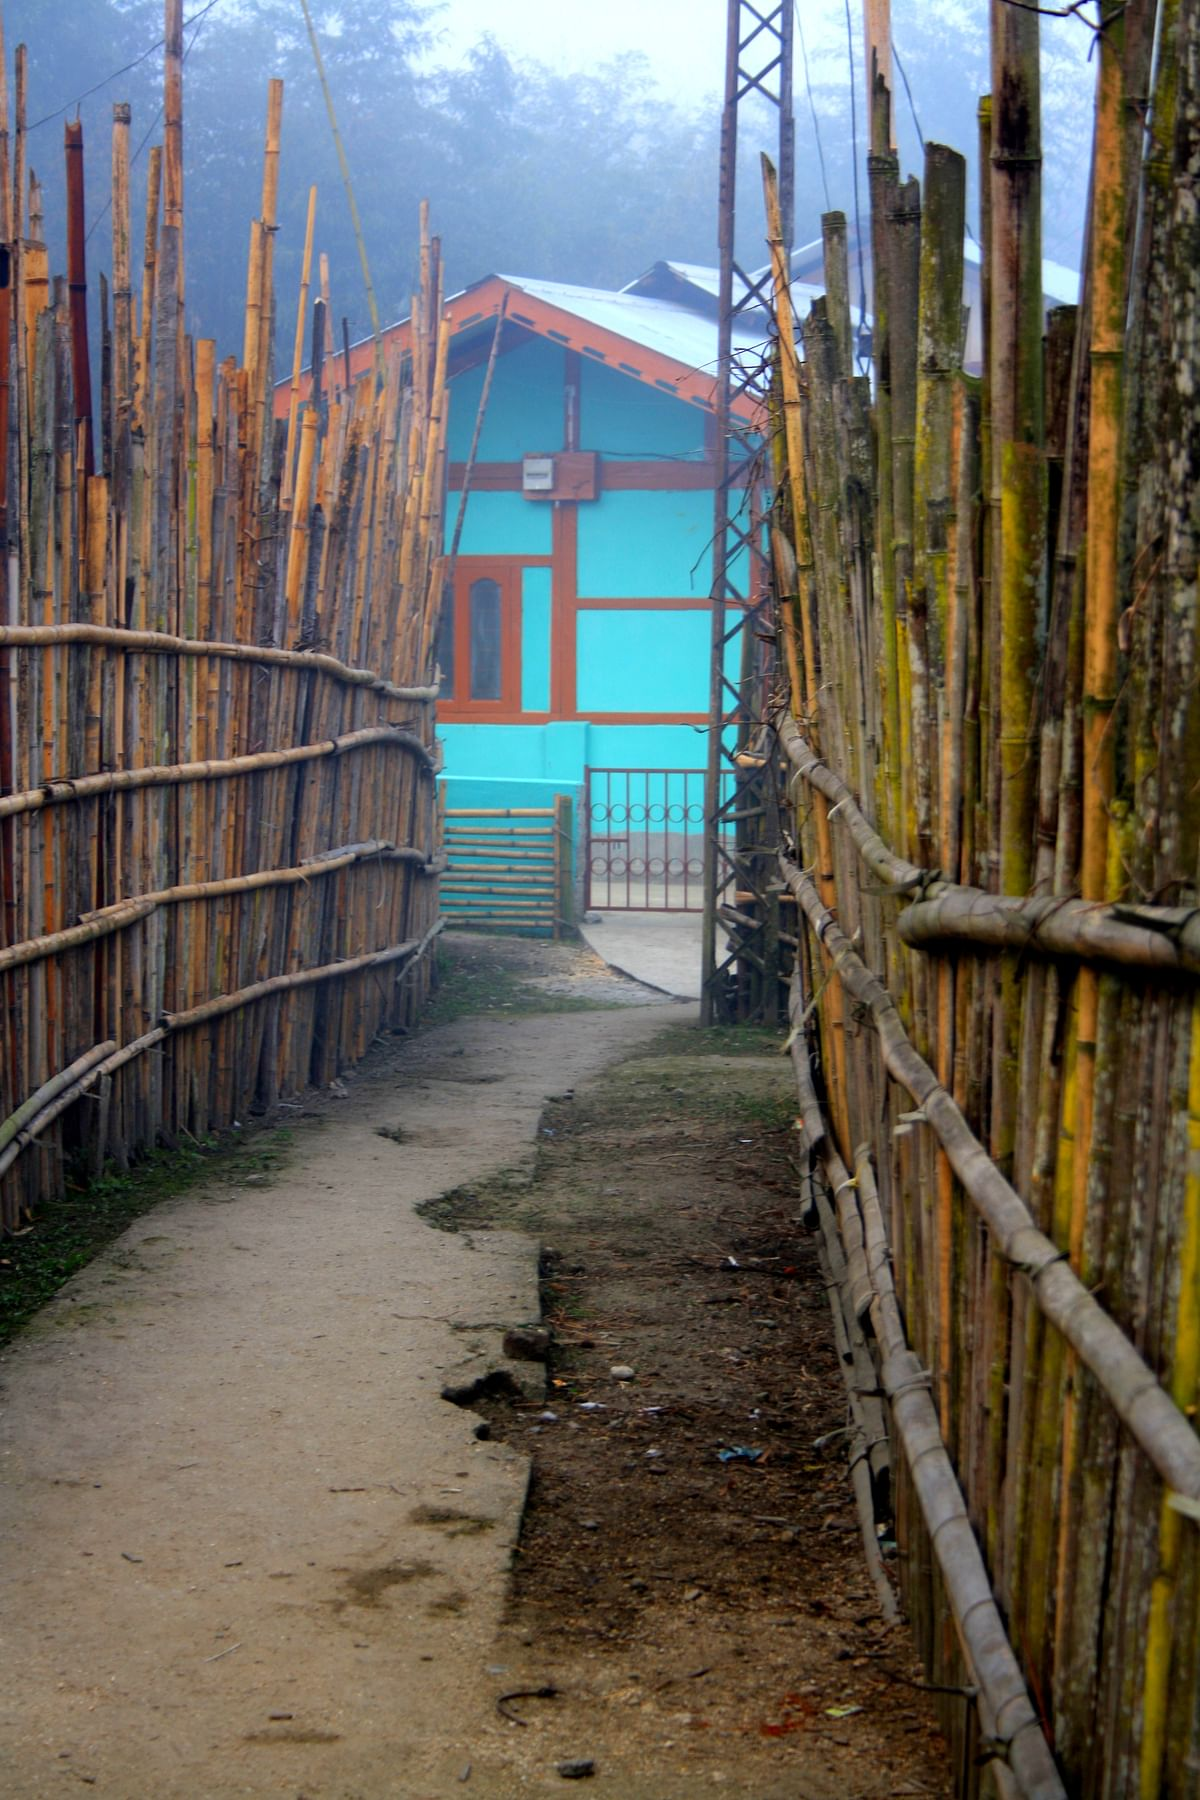 Entering a village inhabited by the Apatanis. (Photo Courtesy: Kushal Chowdhury)